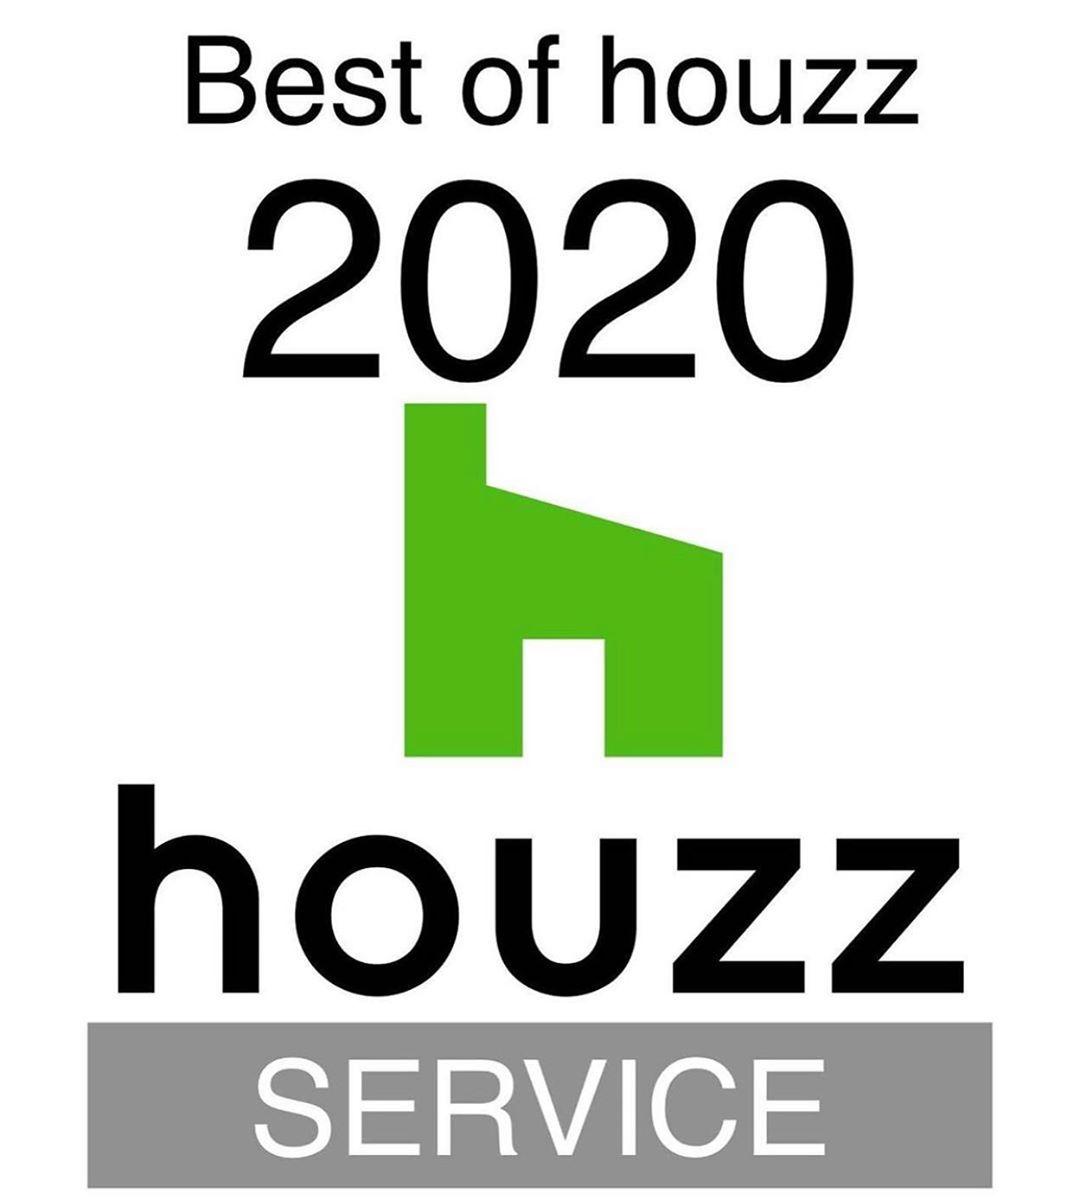 houzz r3modeling buildr3